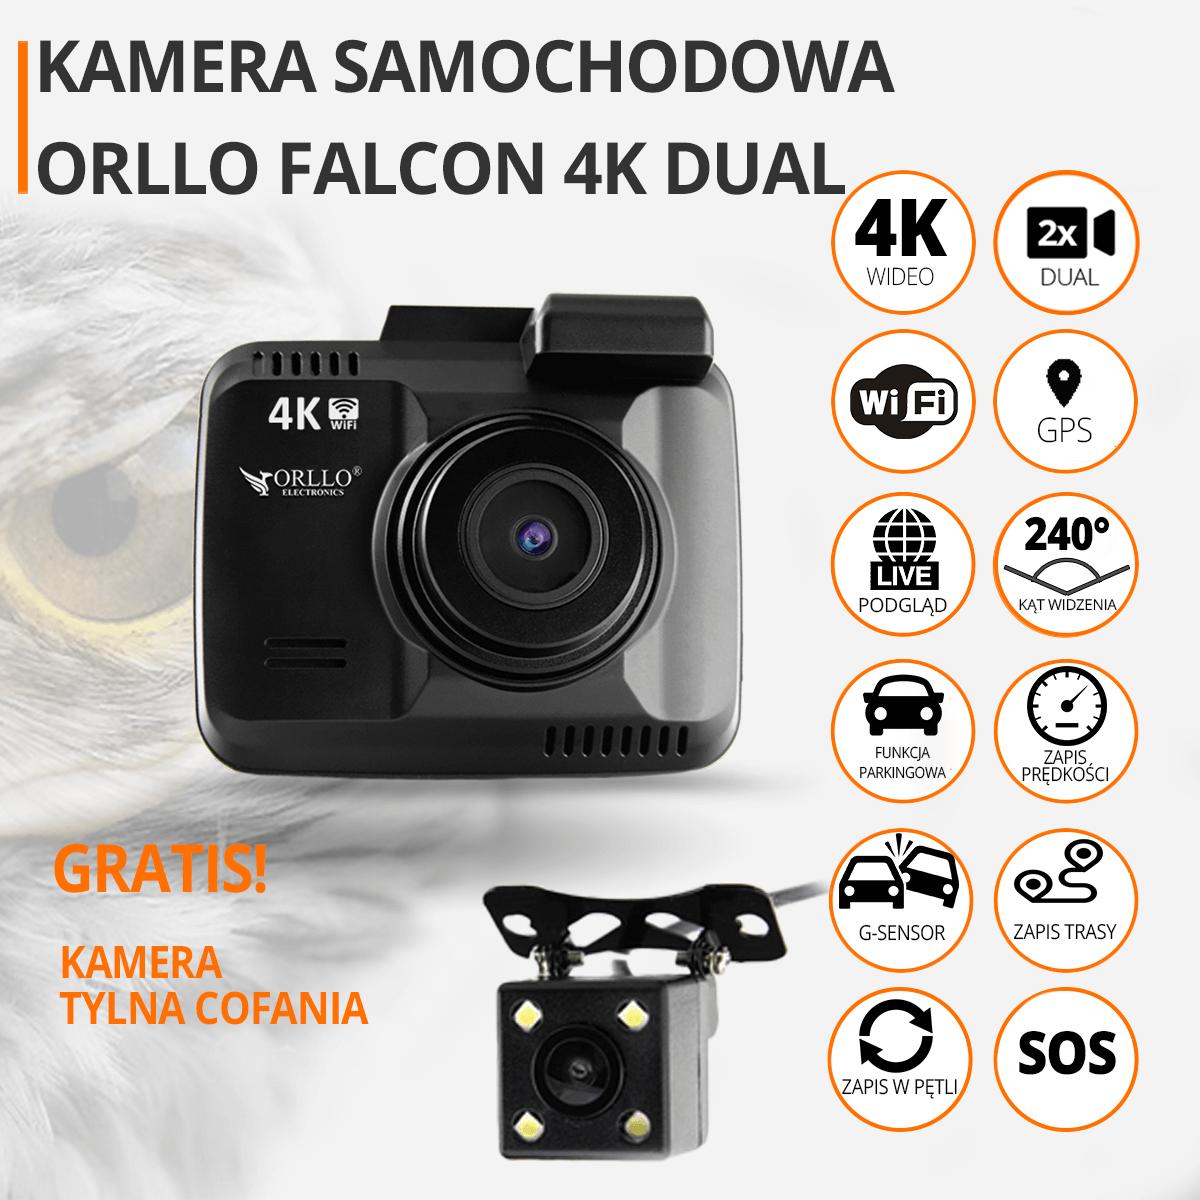 kamerka amochodowa 4K orllo.pl